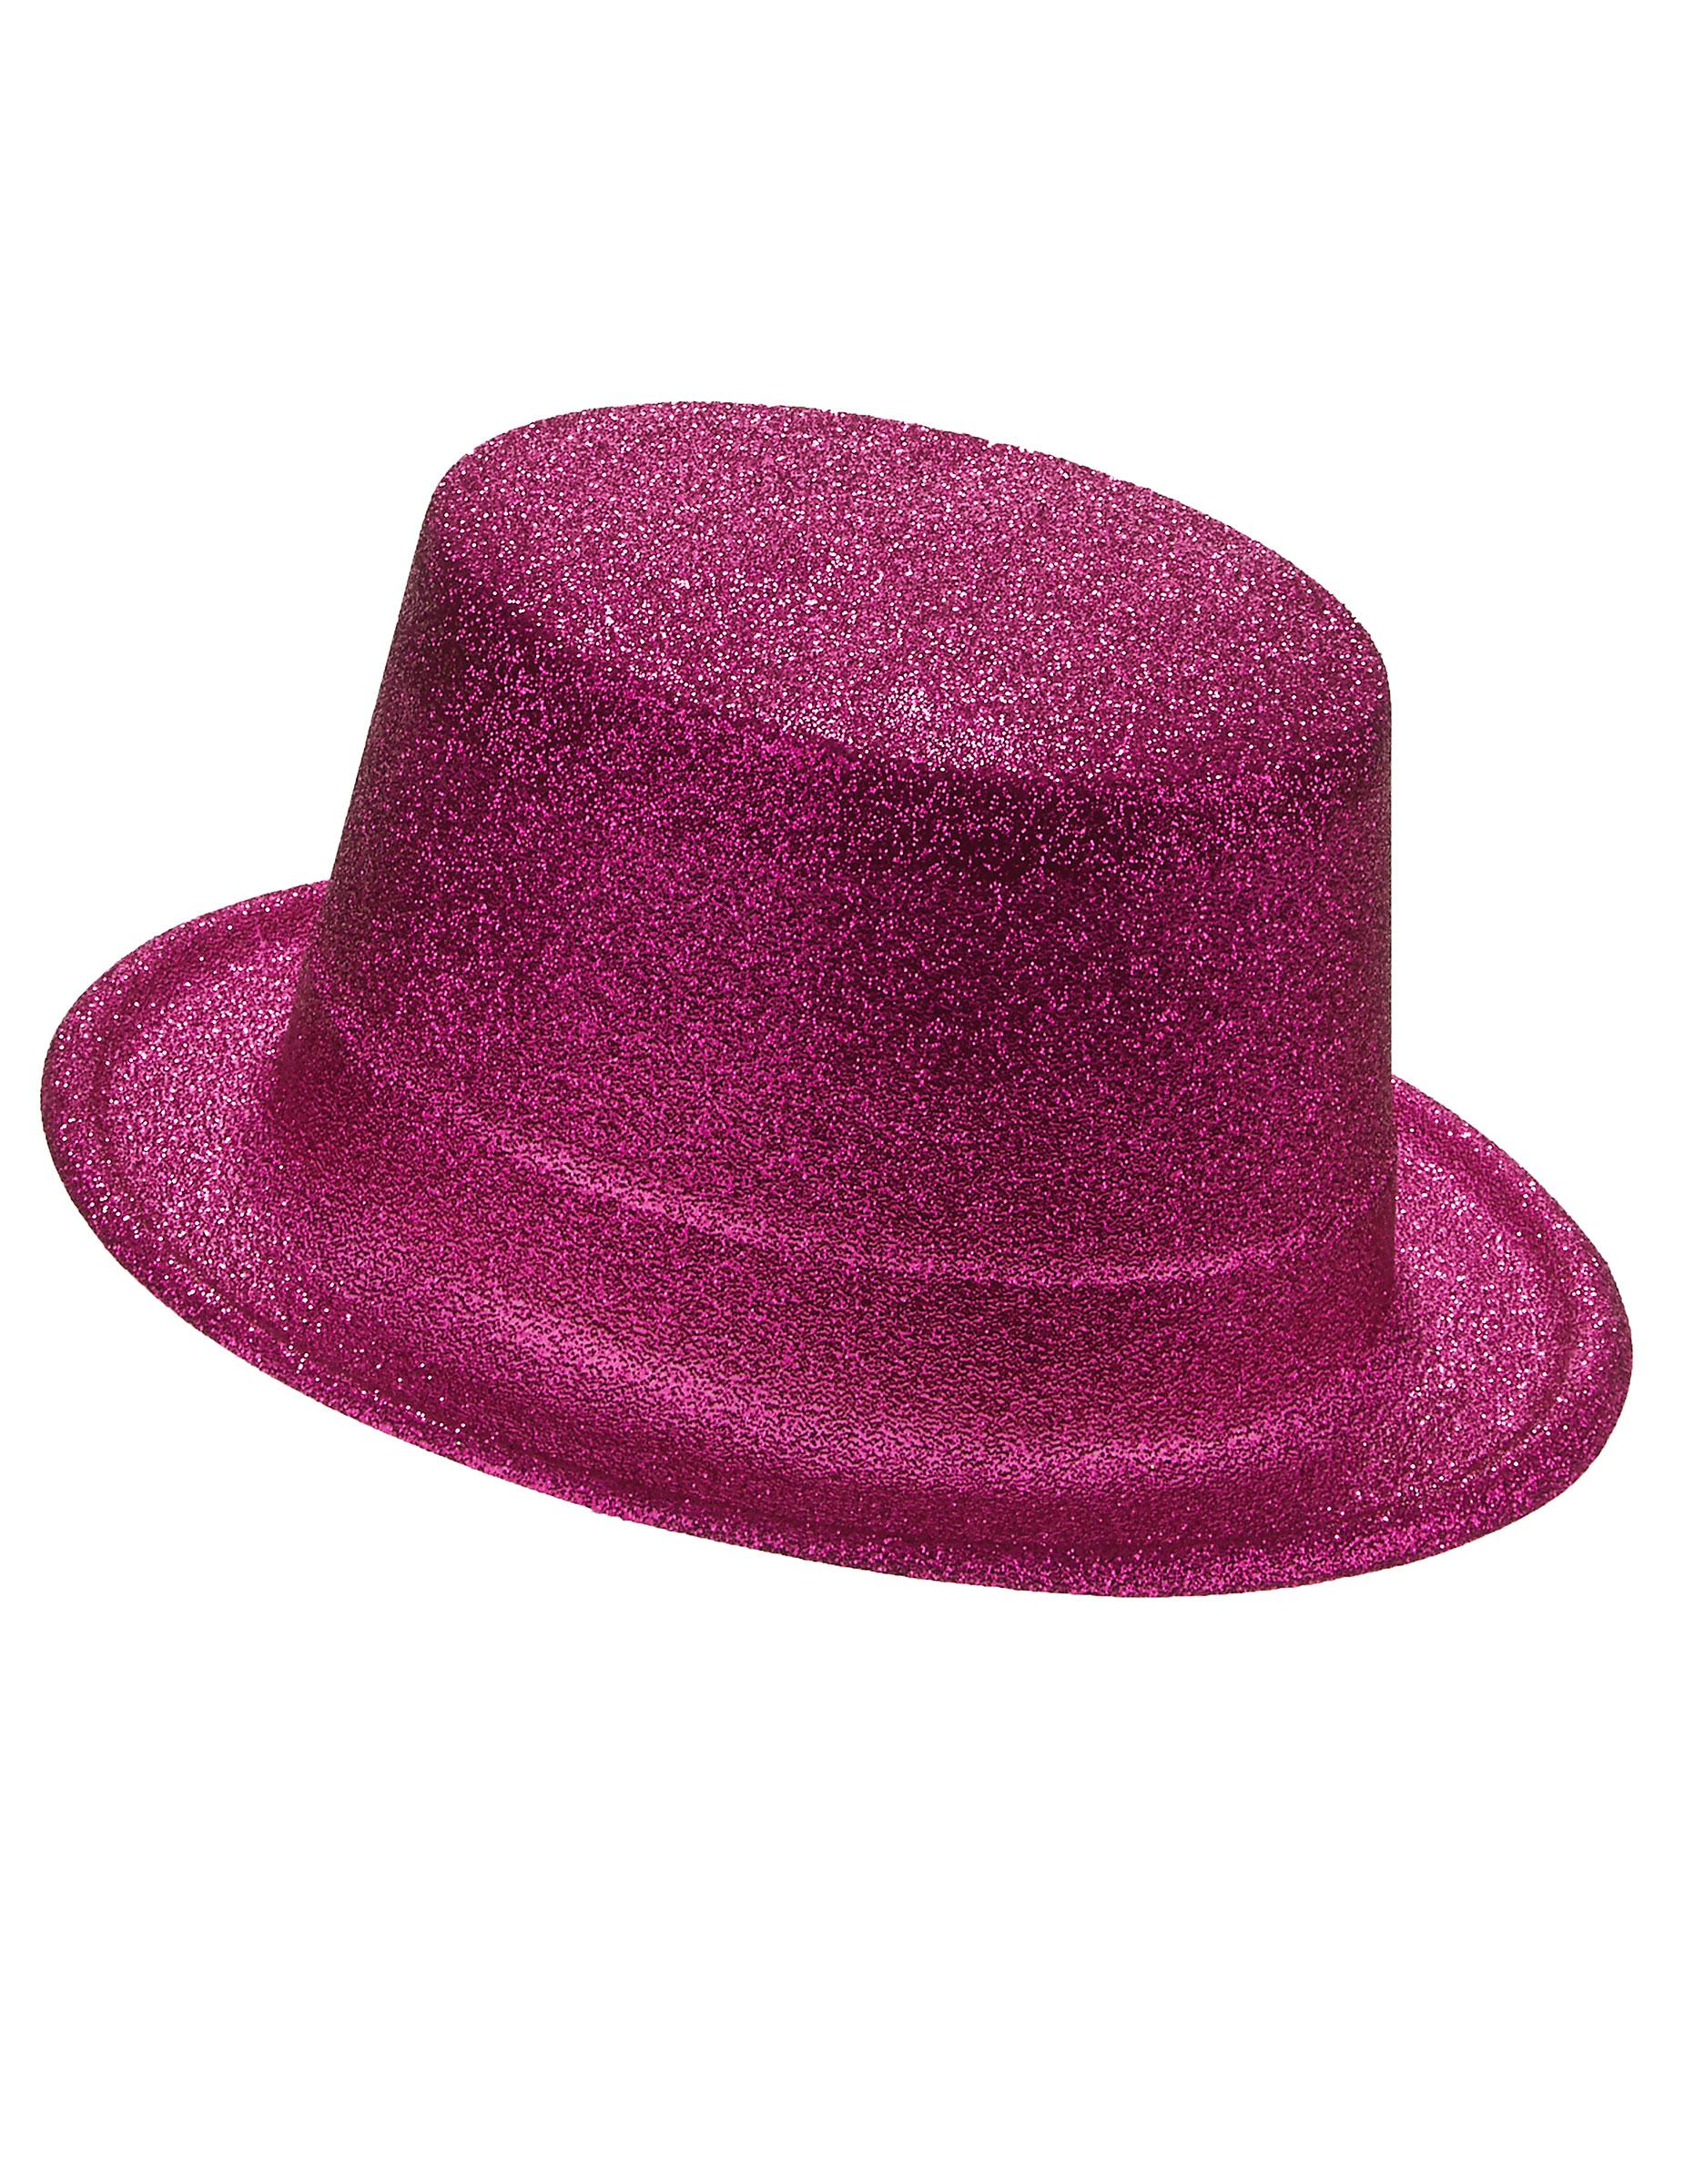 Sombrero de copa de plástico con brillantina rosa adulto e14a14c49b4